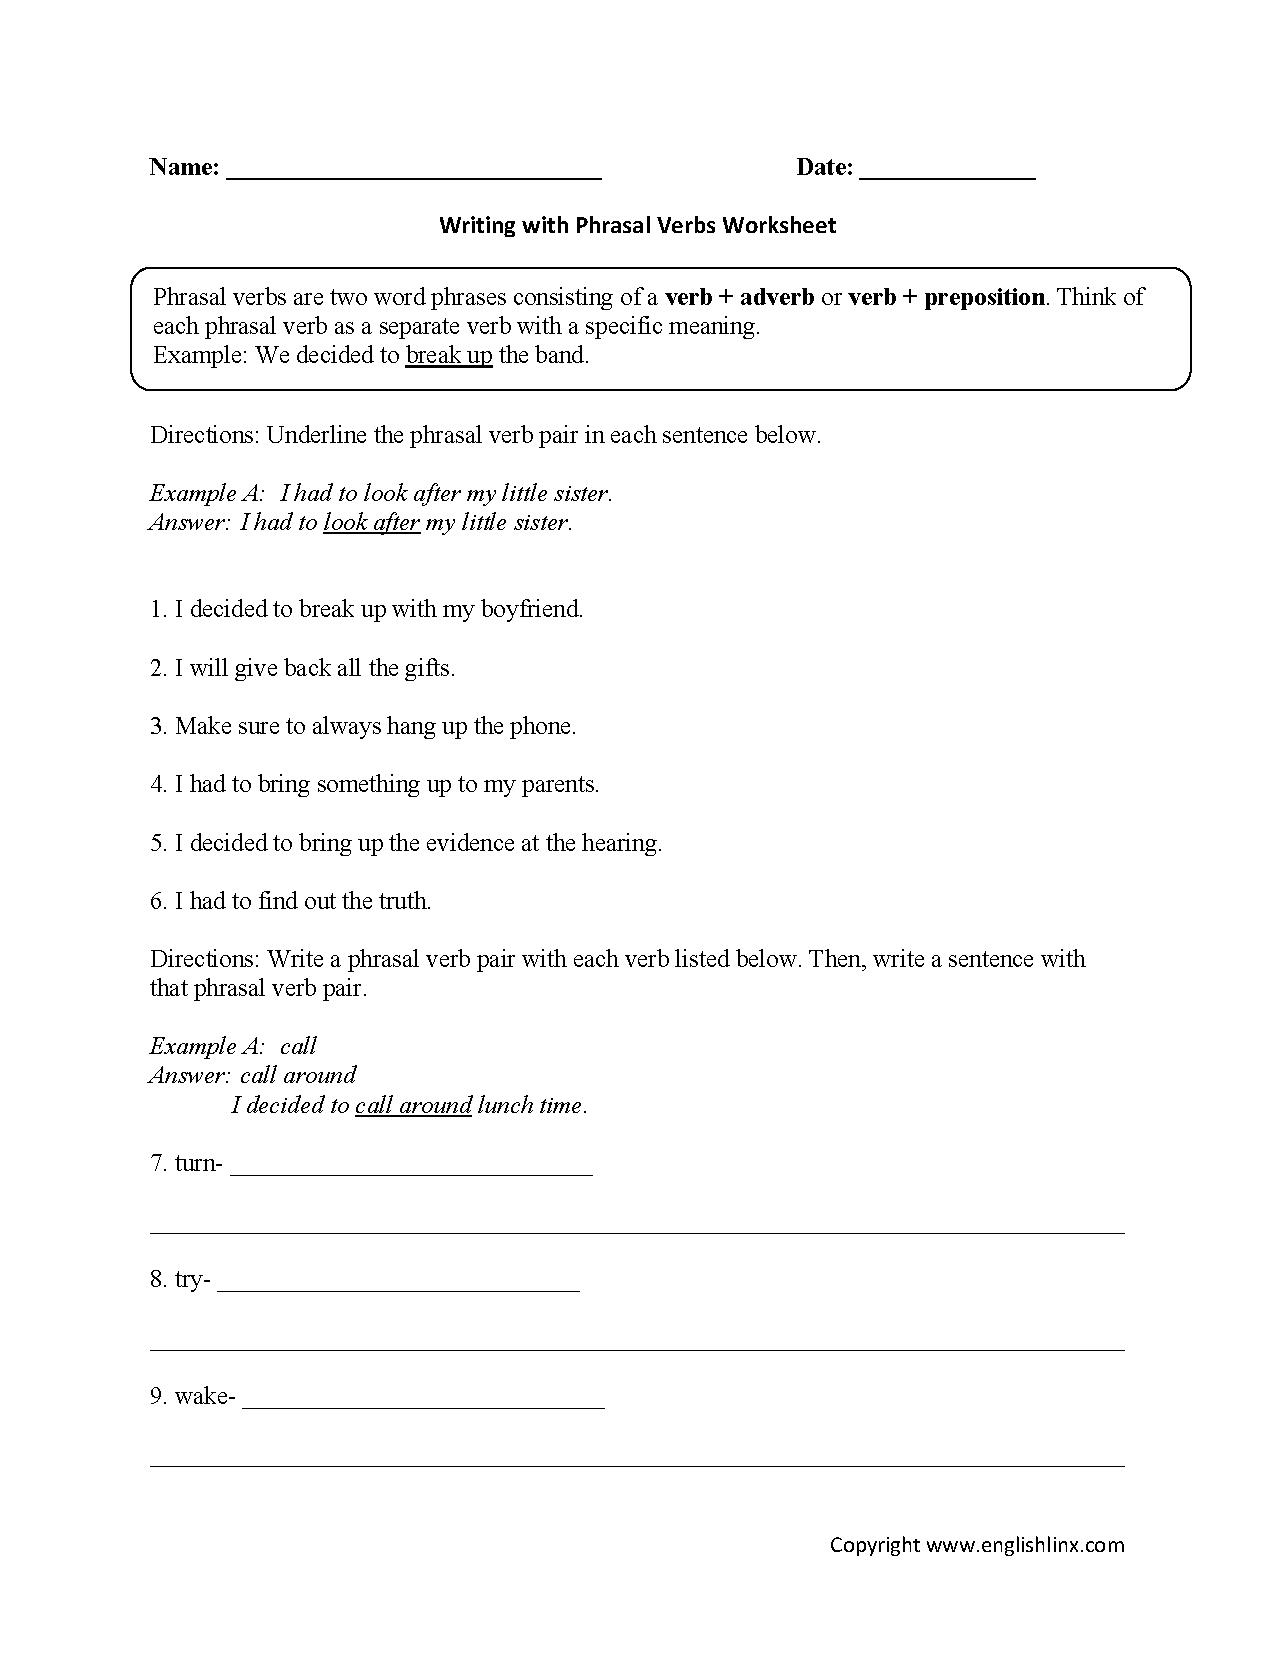 Writing With Phrasal Verb Worksheet